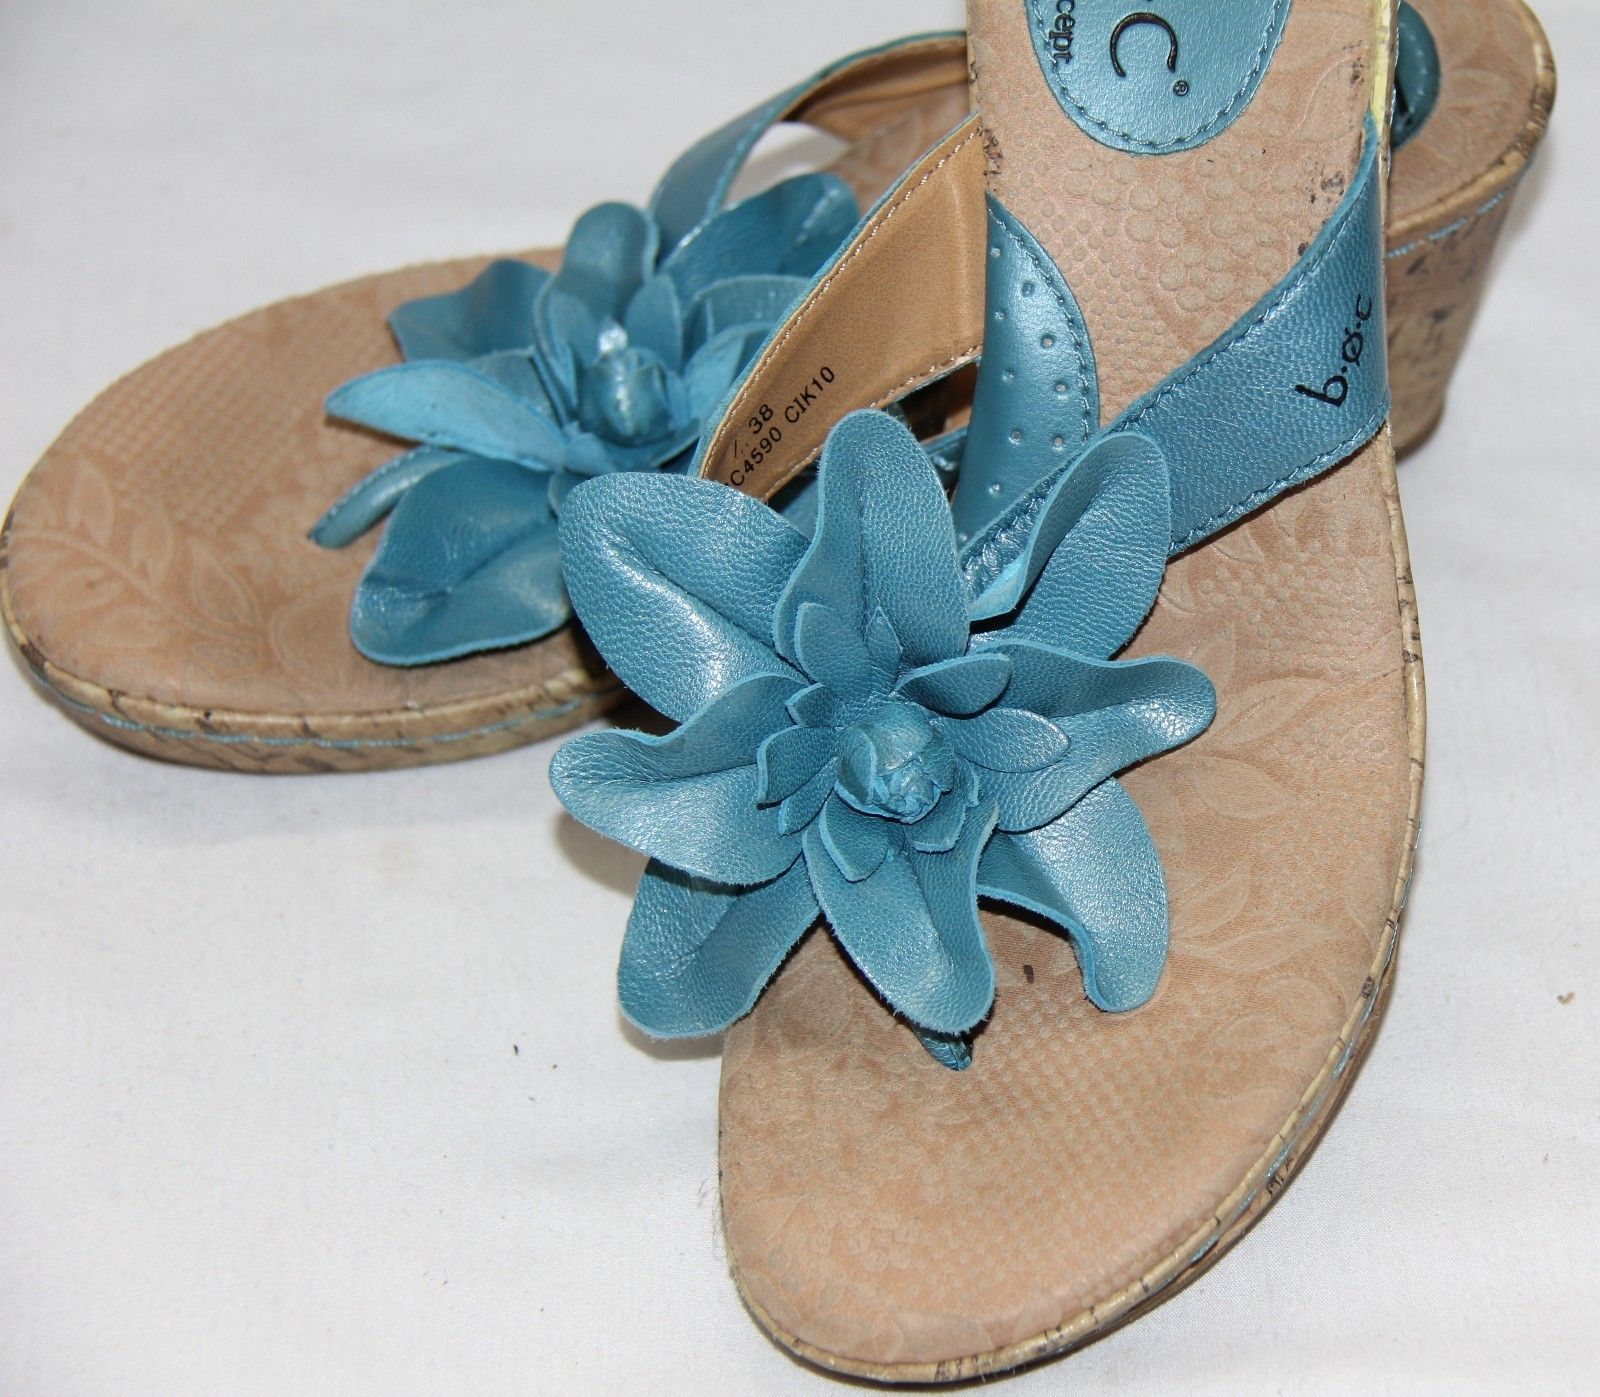 8c0e91e0d27b BOC Born Concept Turquoise Womens Thong Sandals 7 Flower Wedge Heels